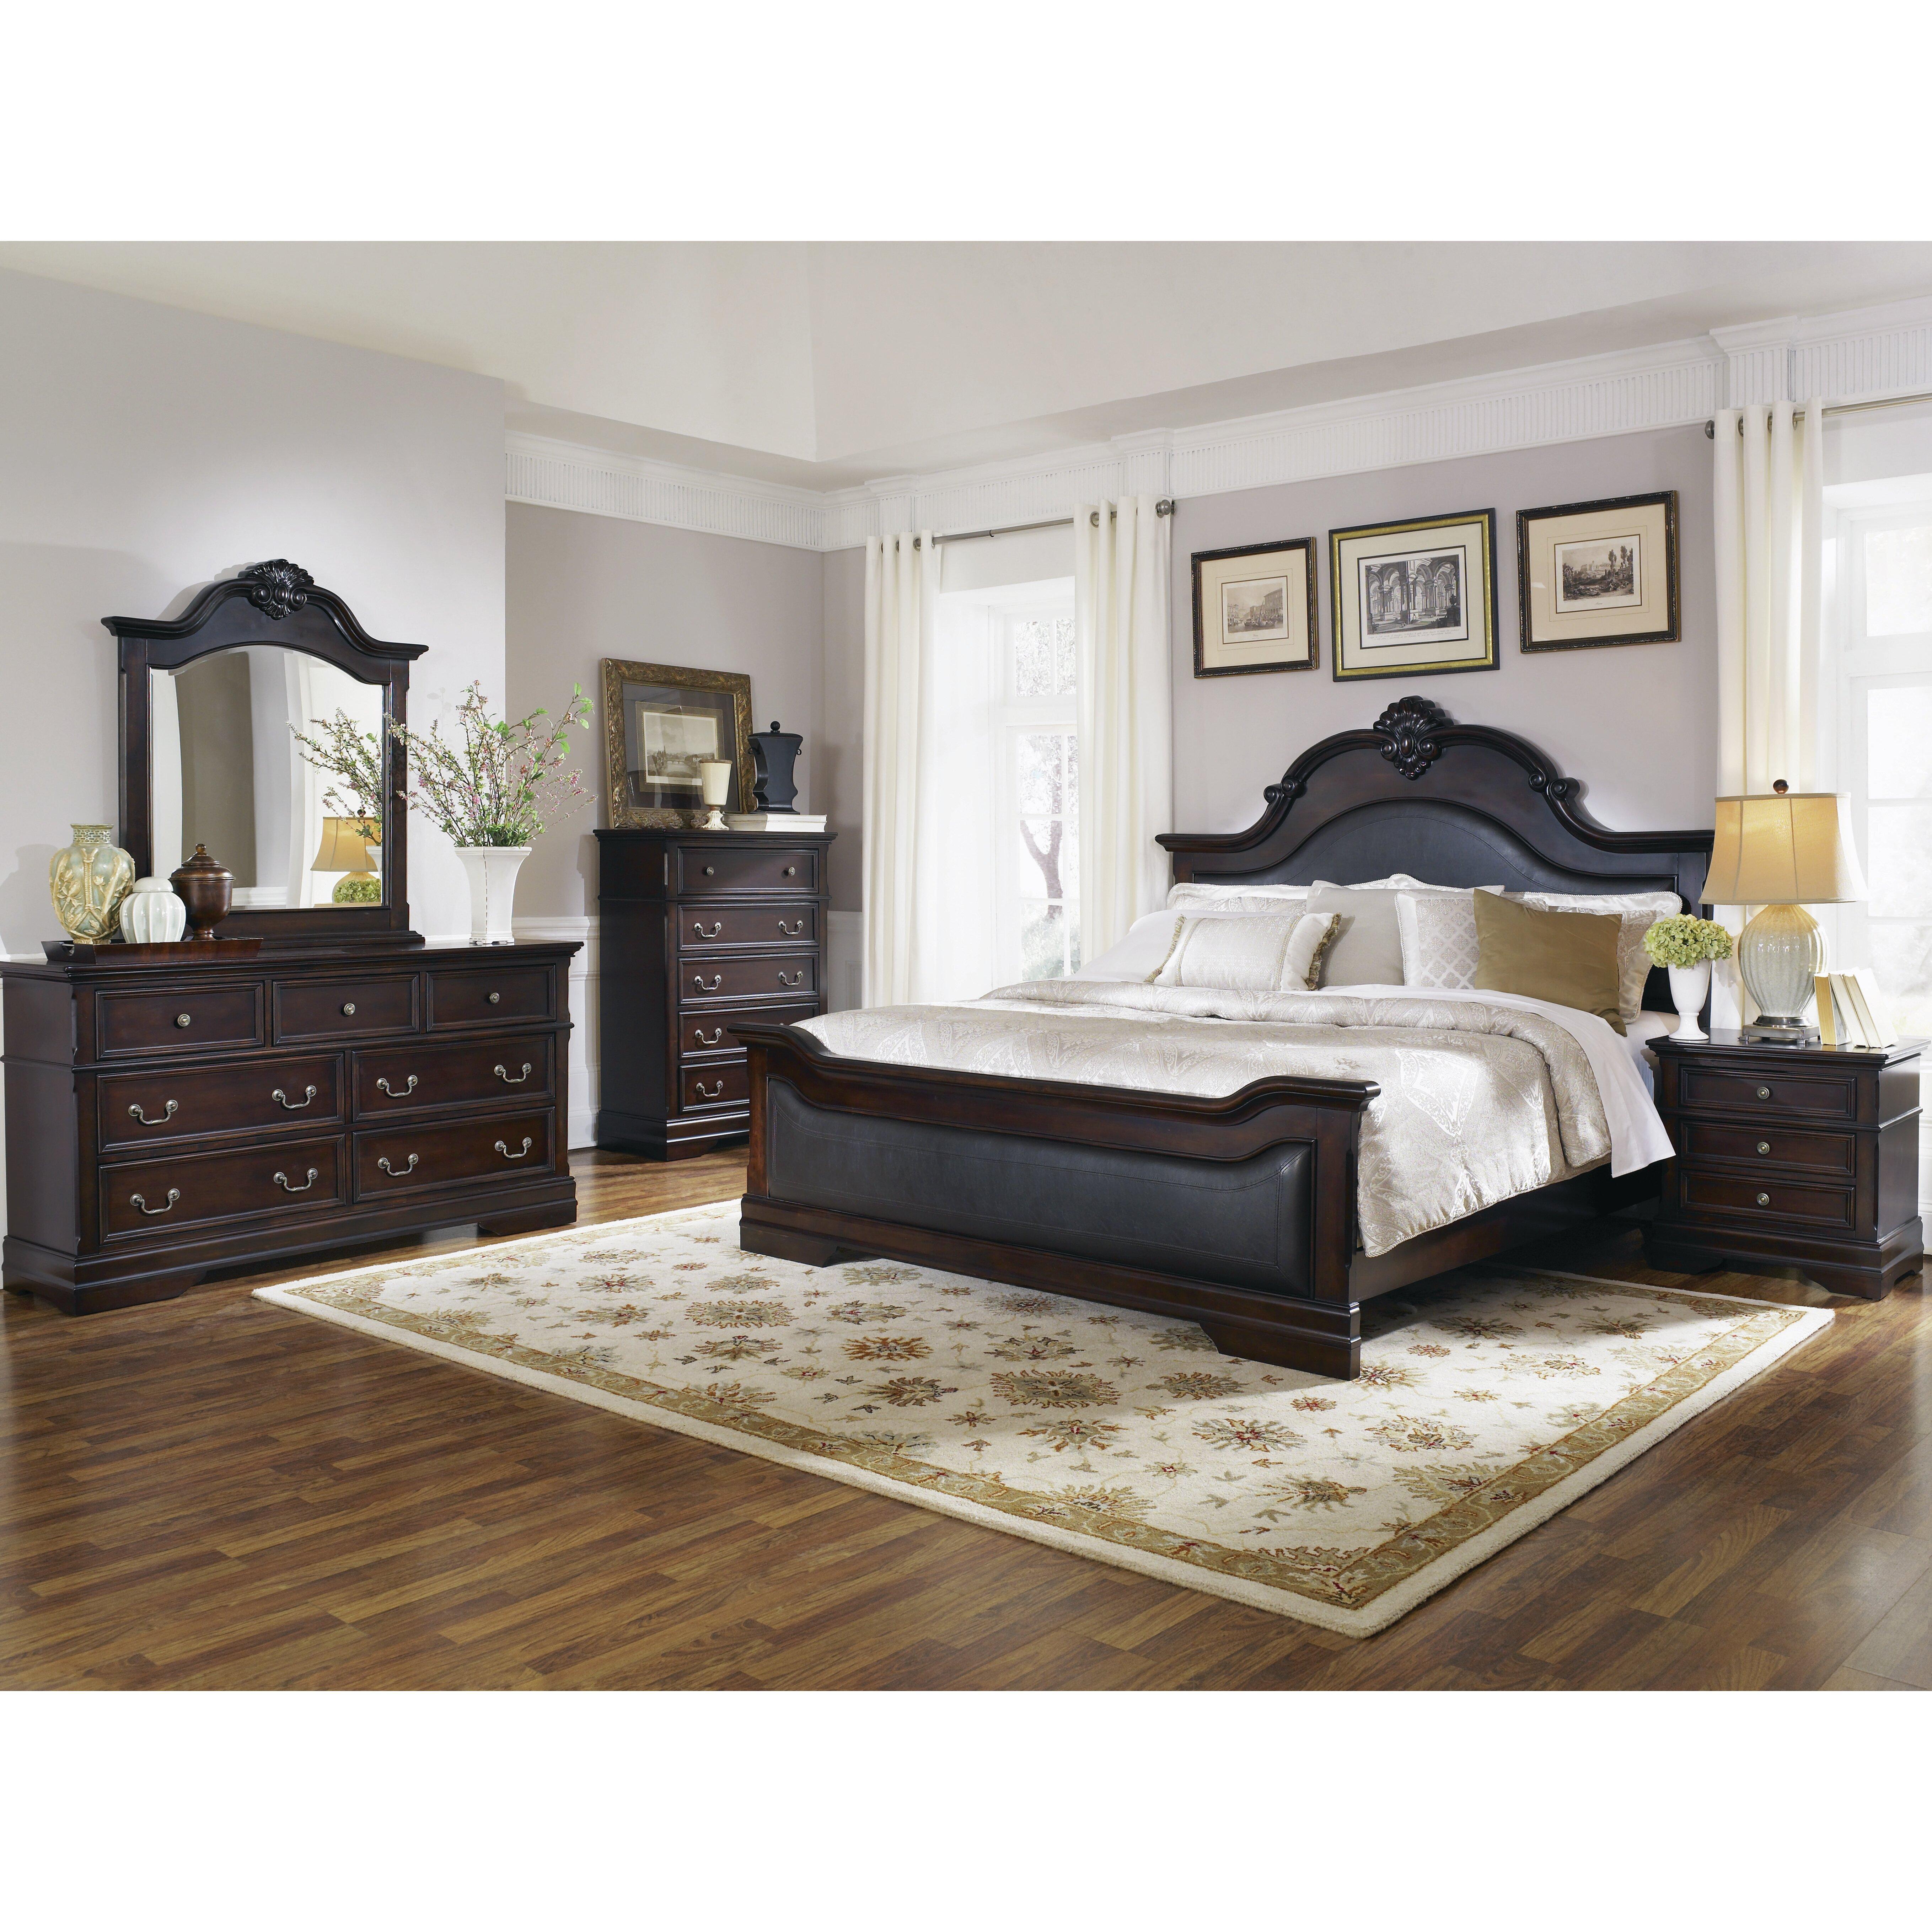 Https Www Wayfair Com Wildon Home 25c2 25ae Panel Customizable Bedroom Set Aoas1361 Html